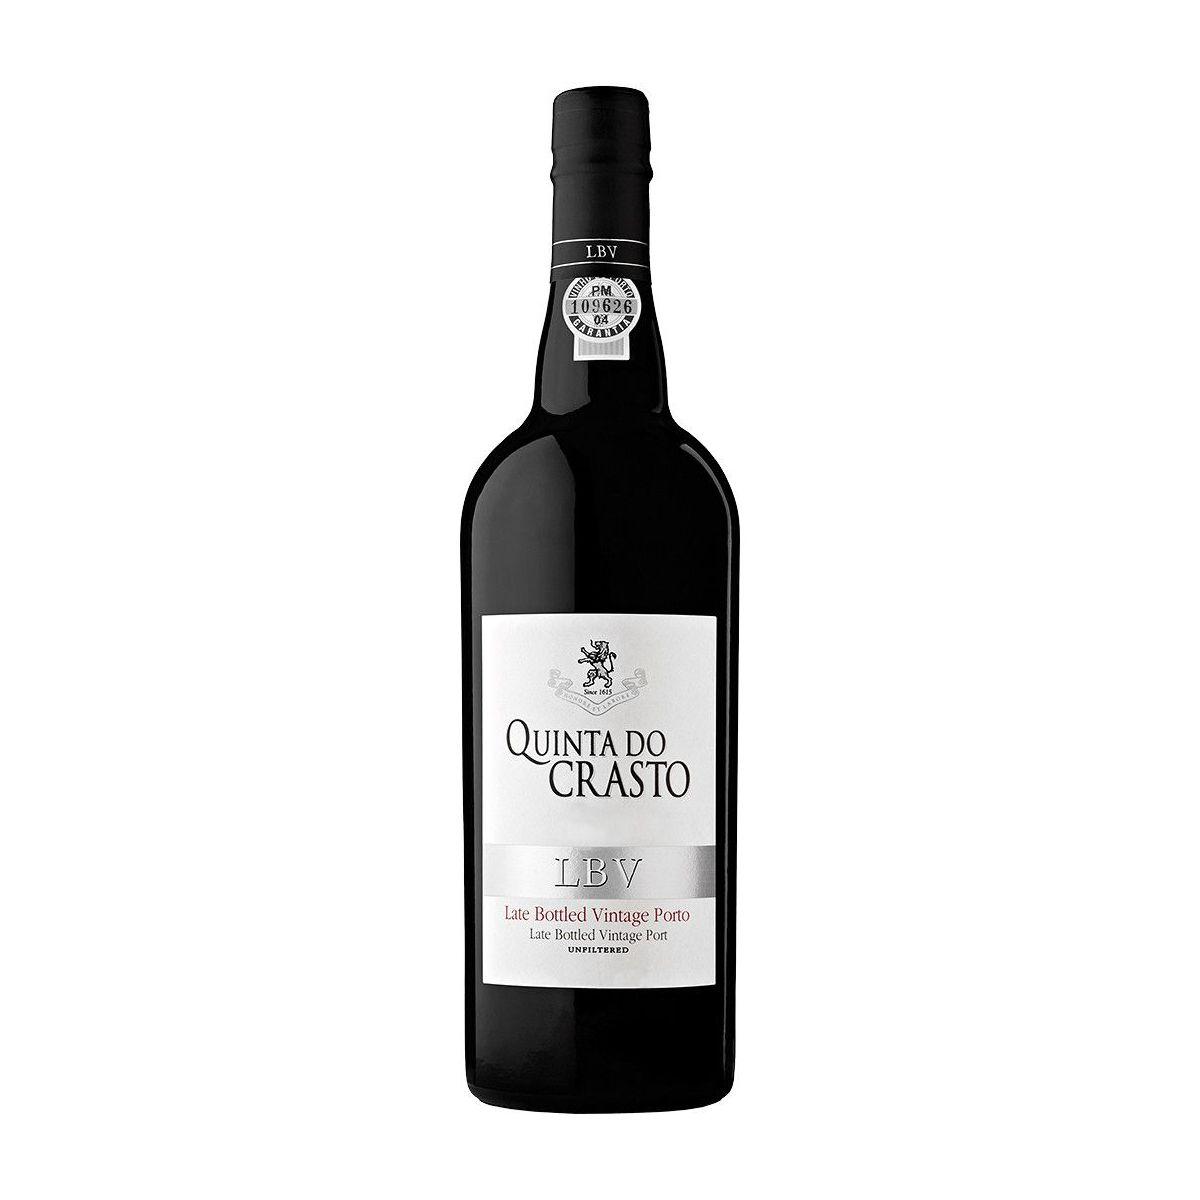 Vinho do Porto Quinta do Crasto LBV (Late Bottled Vintage)